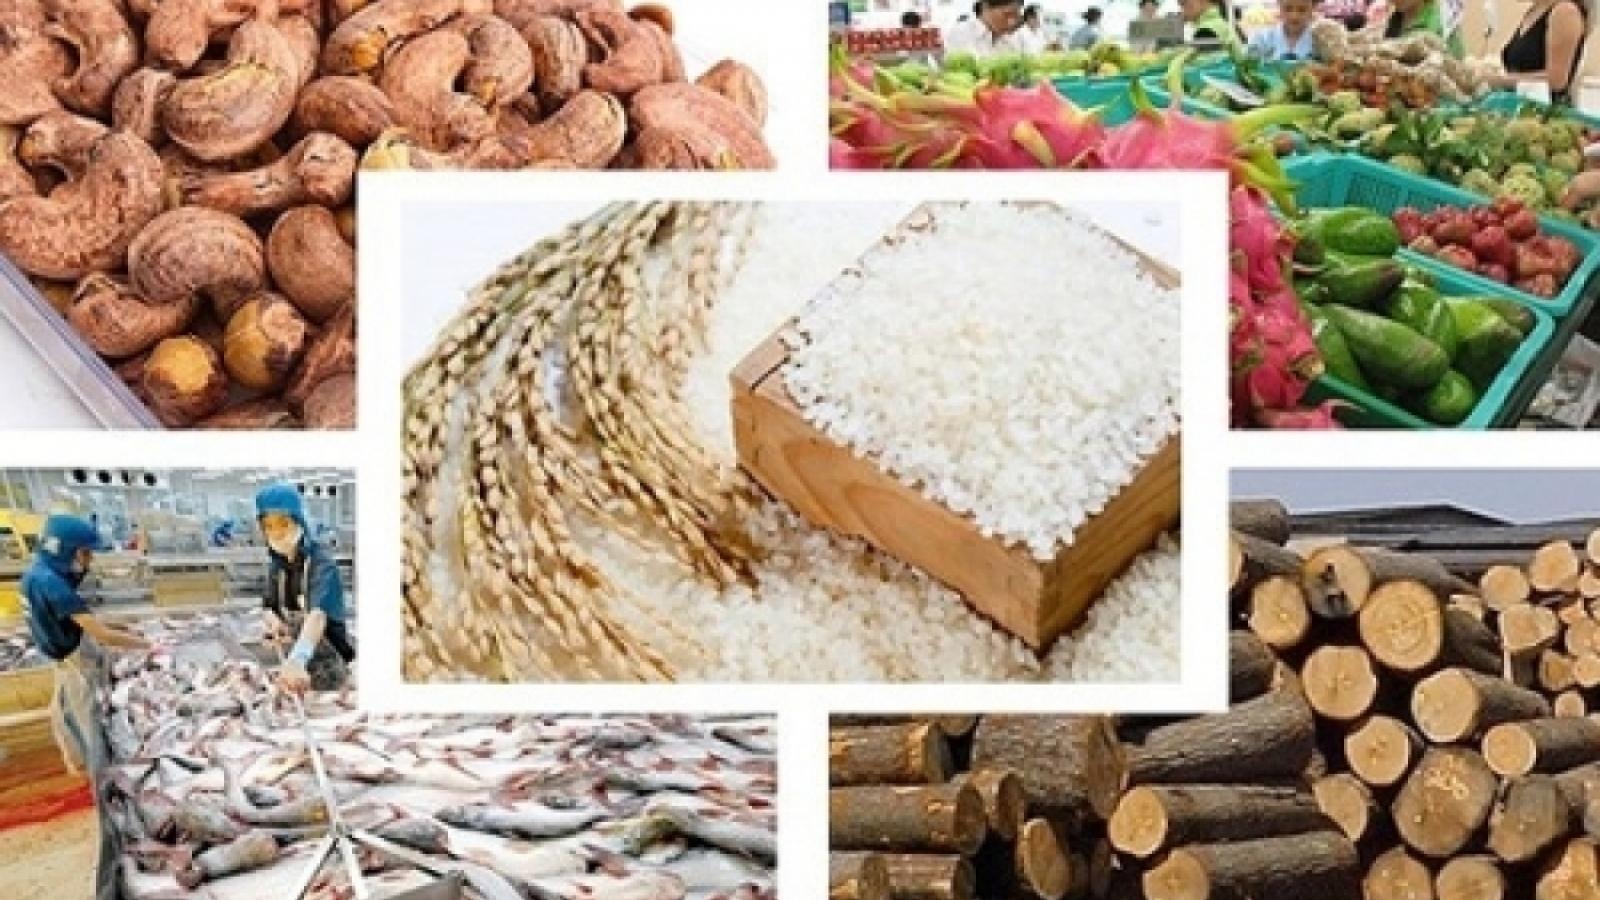 Farm produce exports enjoy US$3.3 bln trade surplus